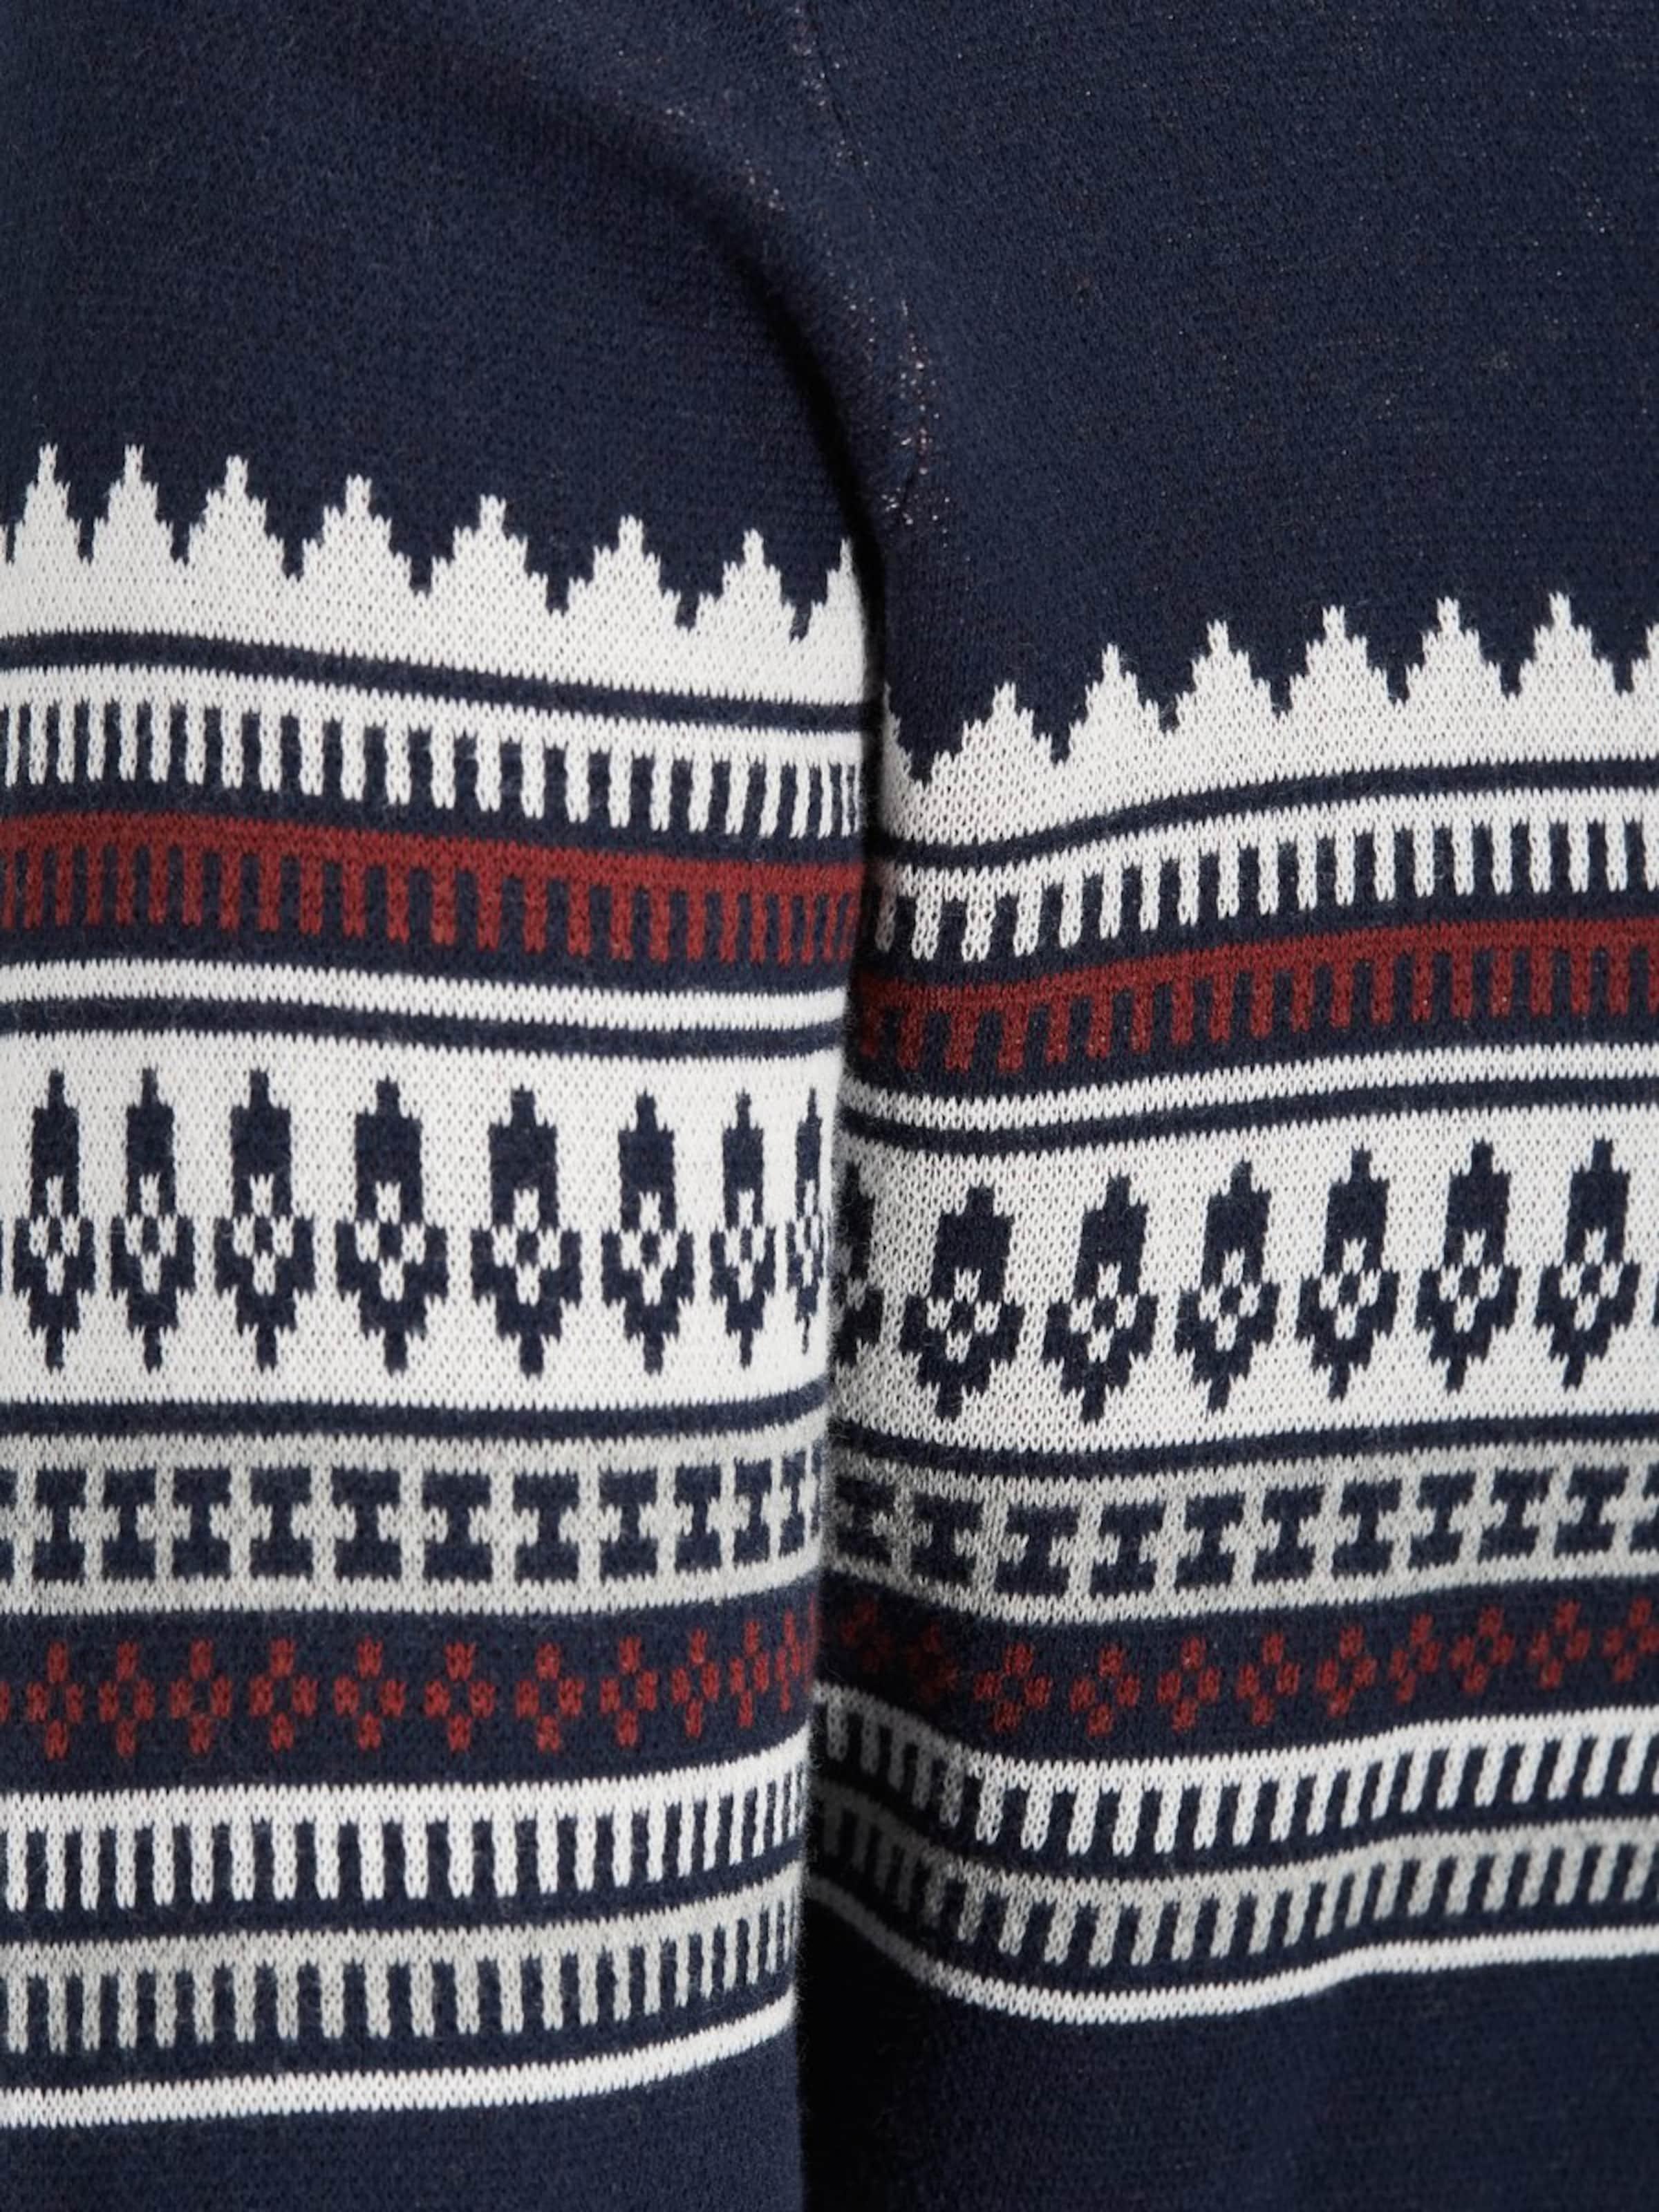 Blanc En Pull over Bleu ClairGris Foncé Produkt w8nOPX0k